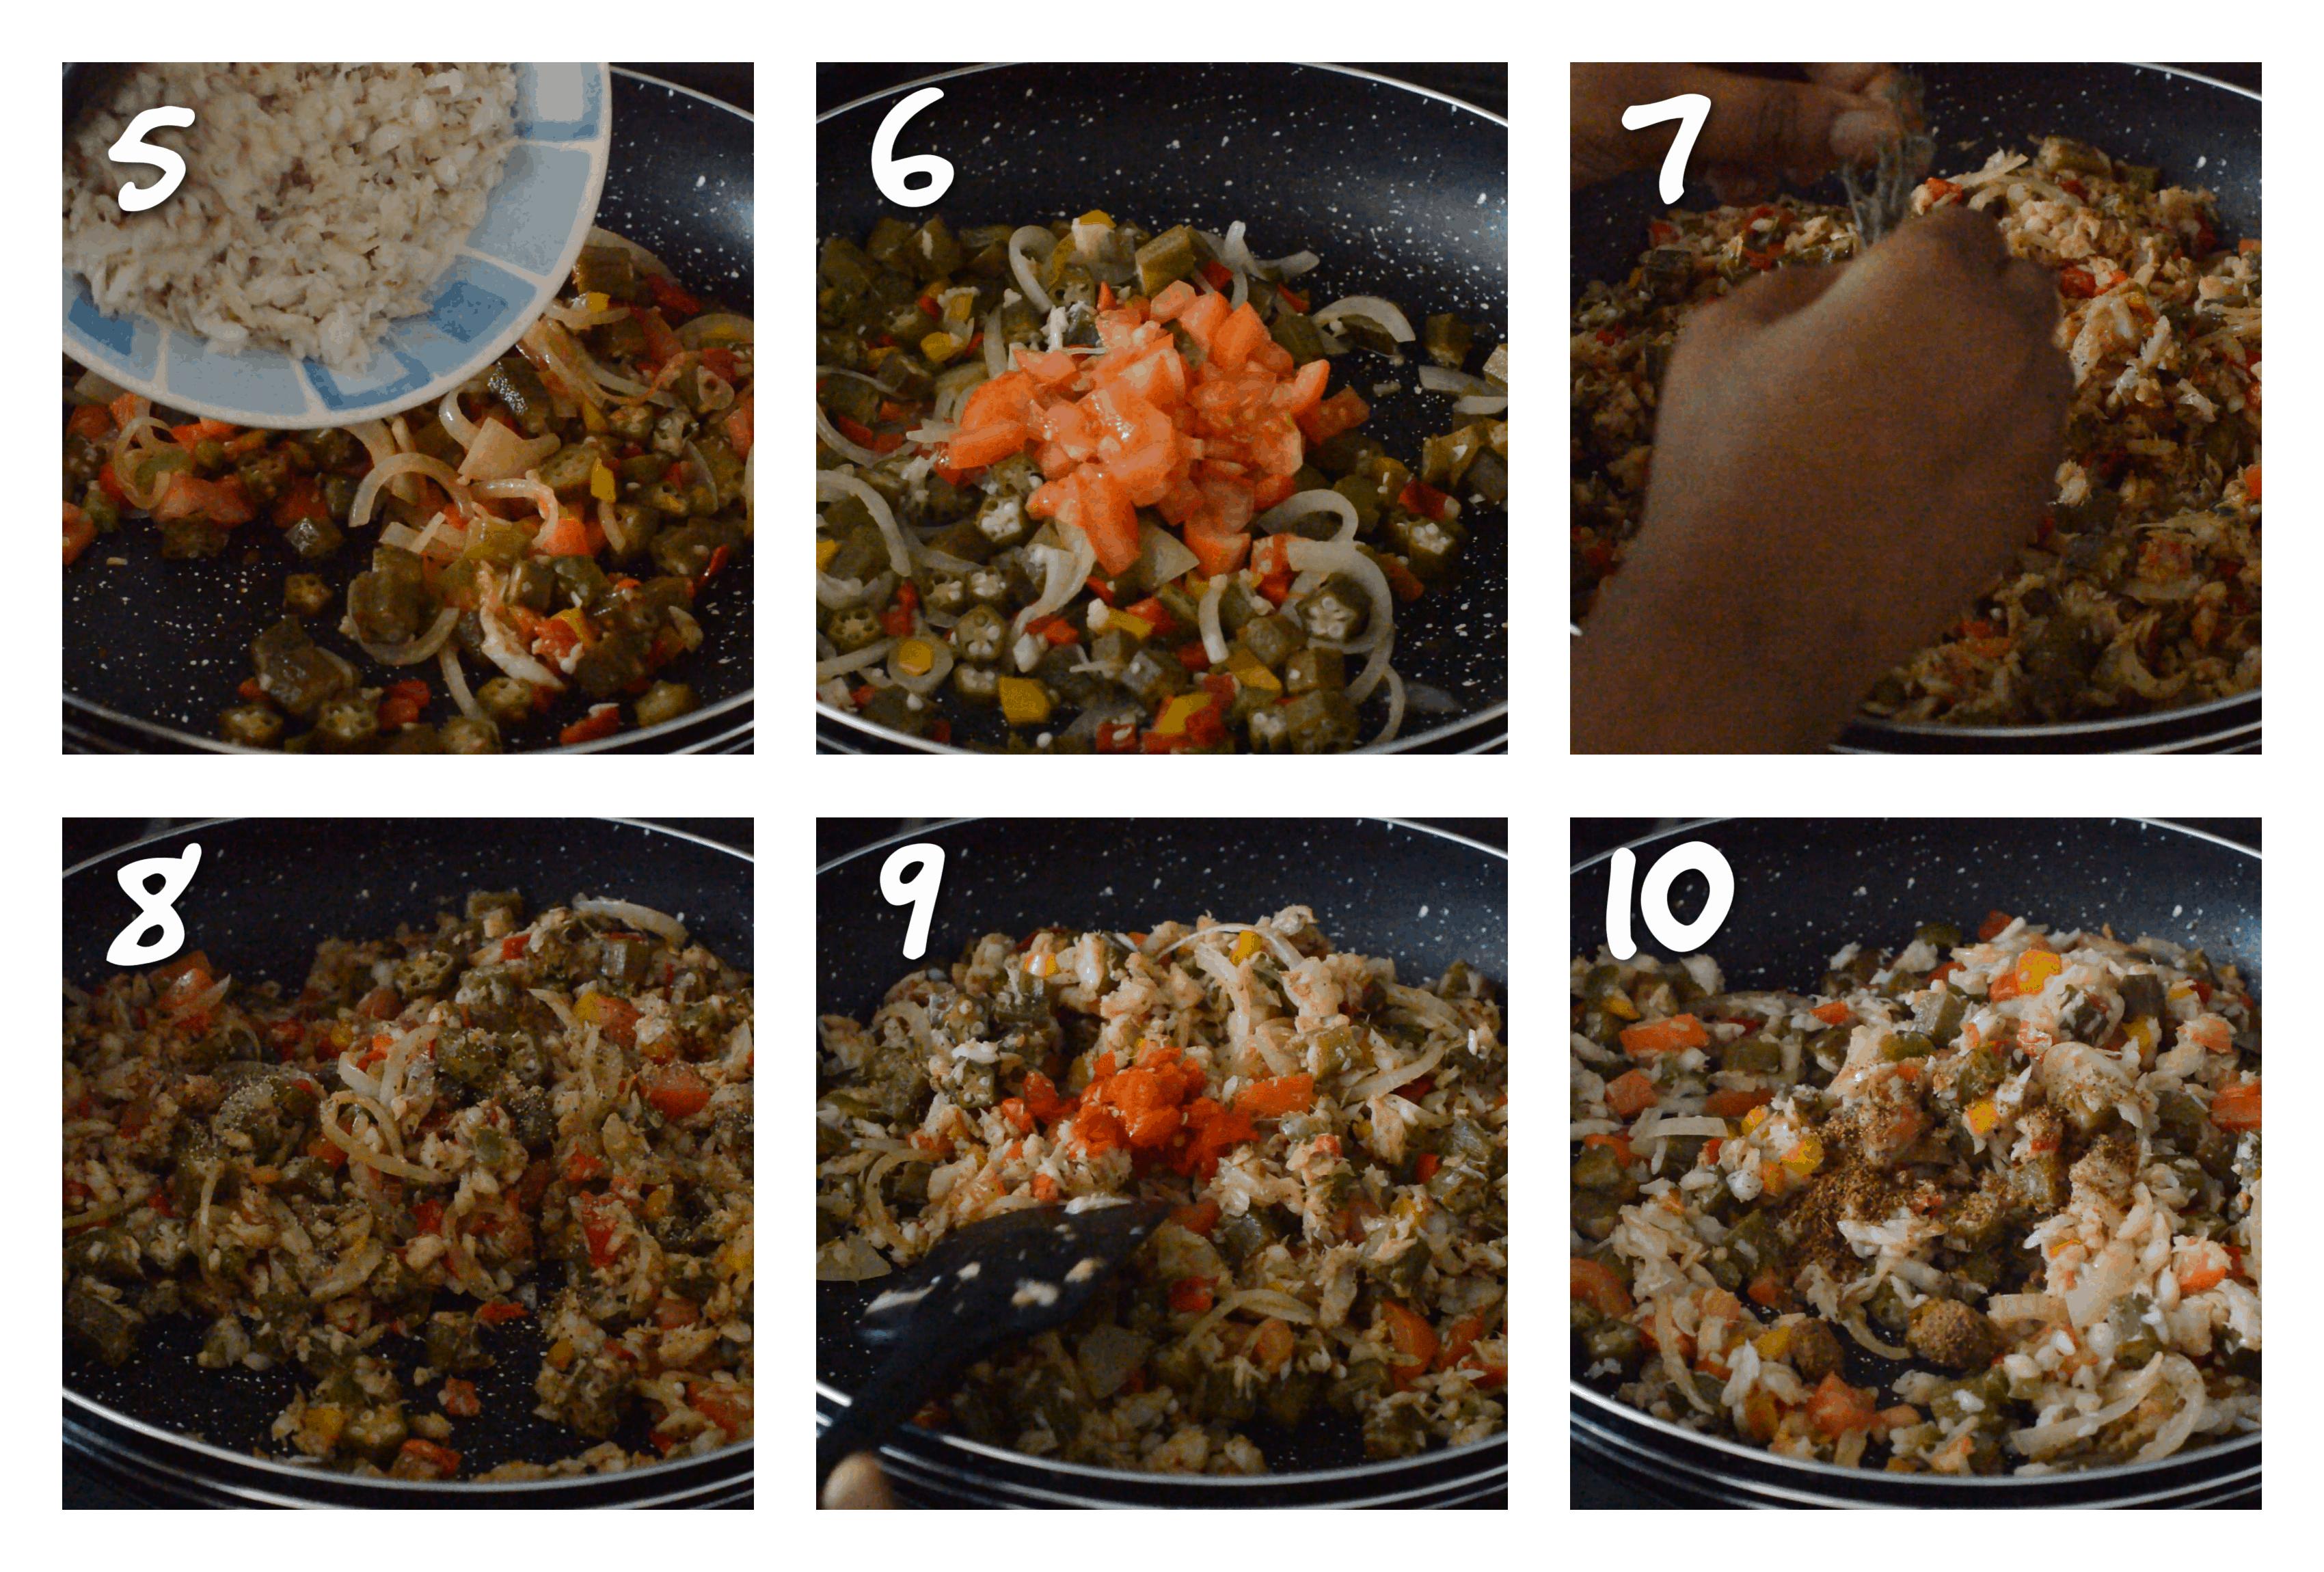 steps5-10 adding the saltfish,thyme and seasoning